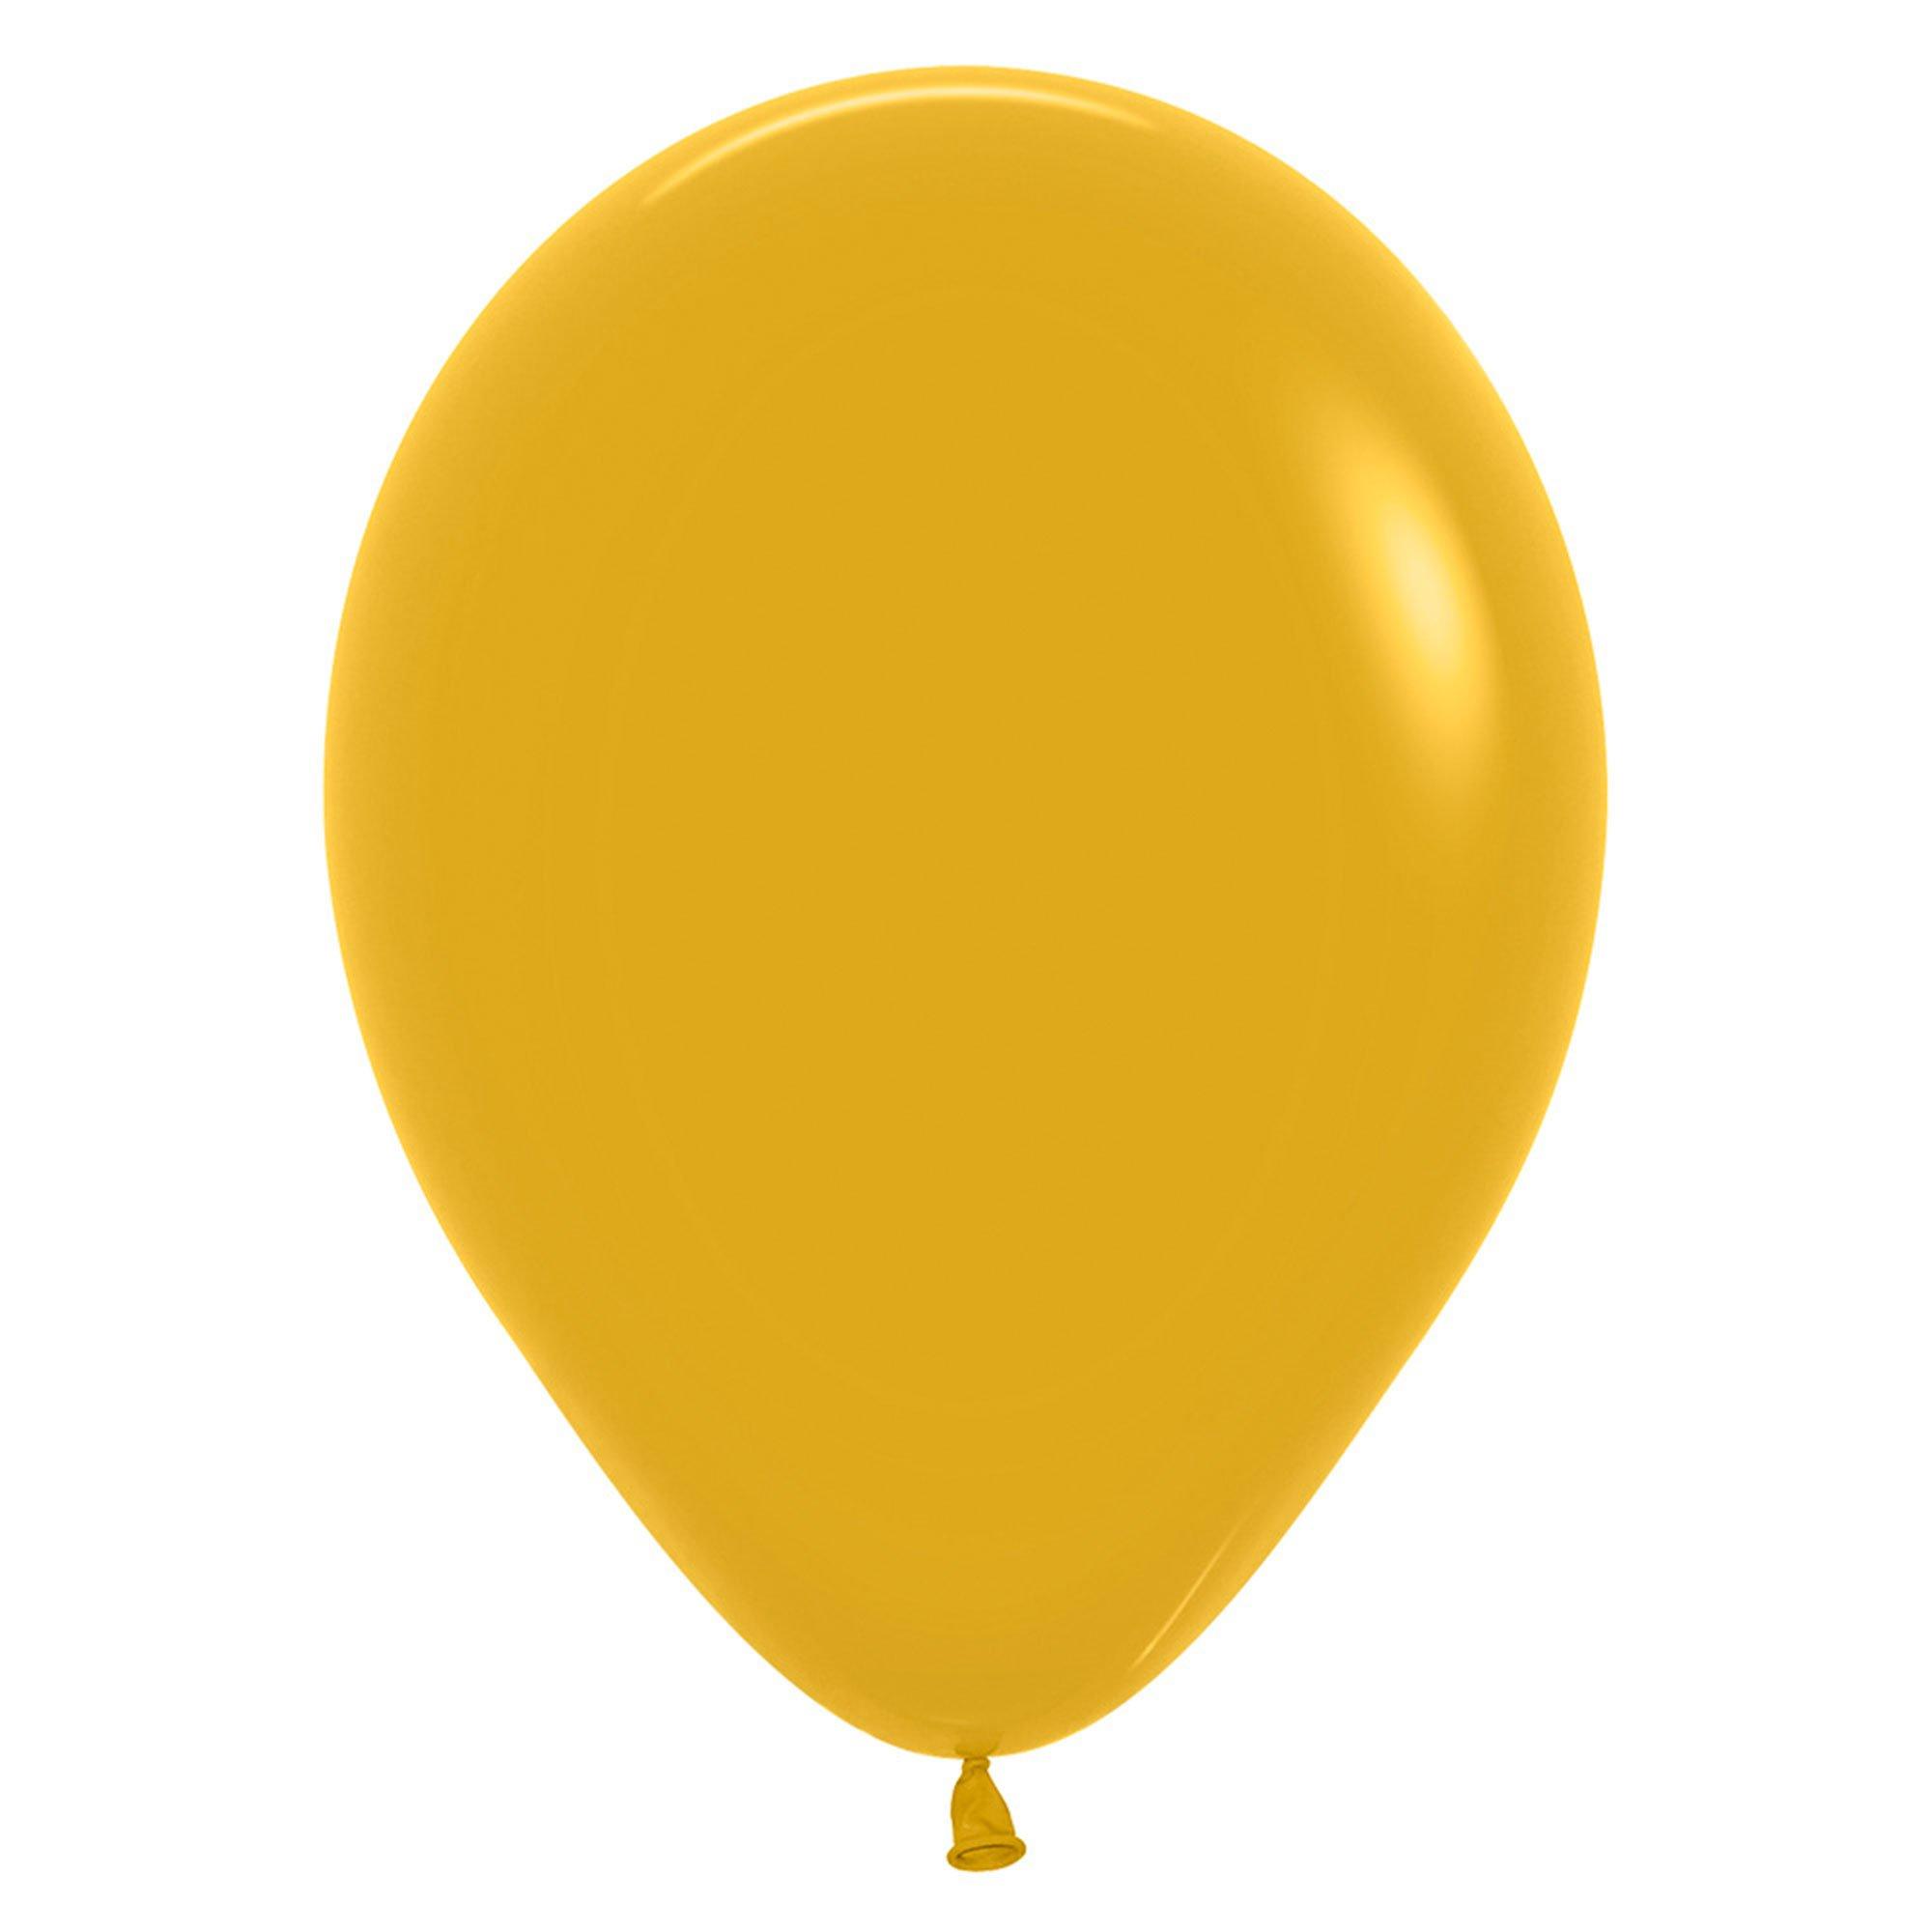 Sempertex 12cm Fashion Mustard 023, 50PK